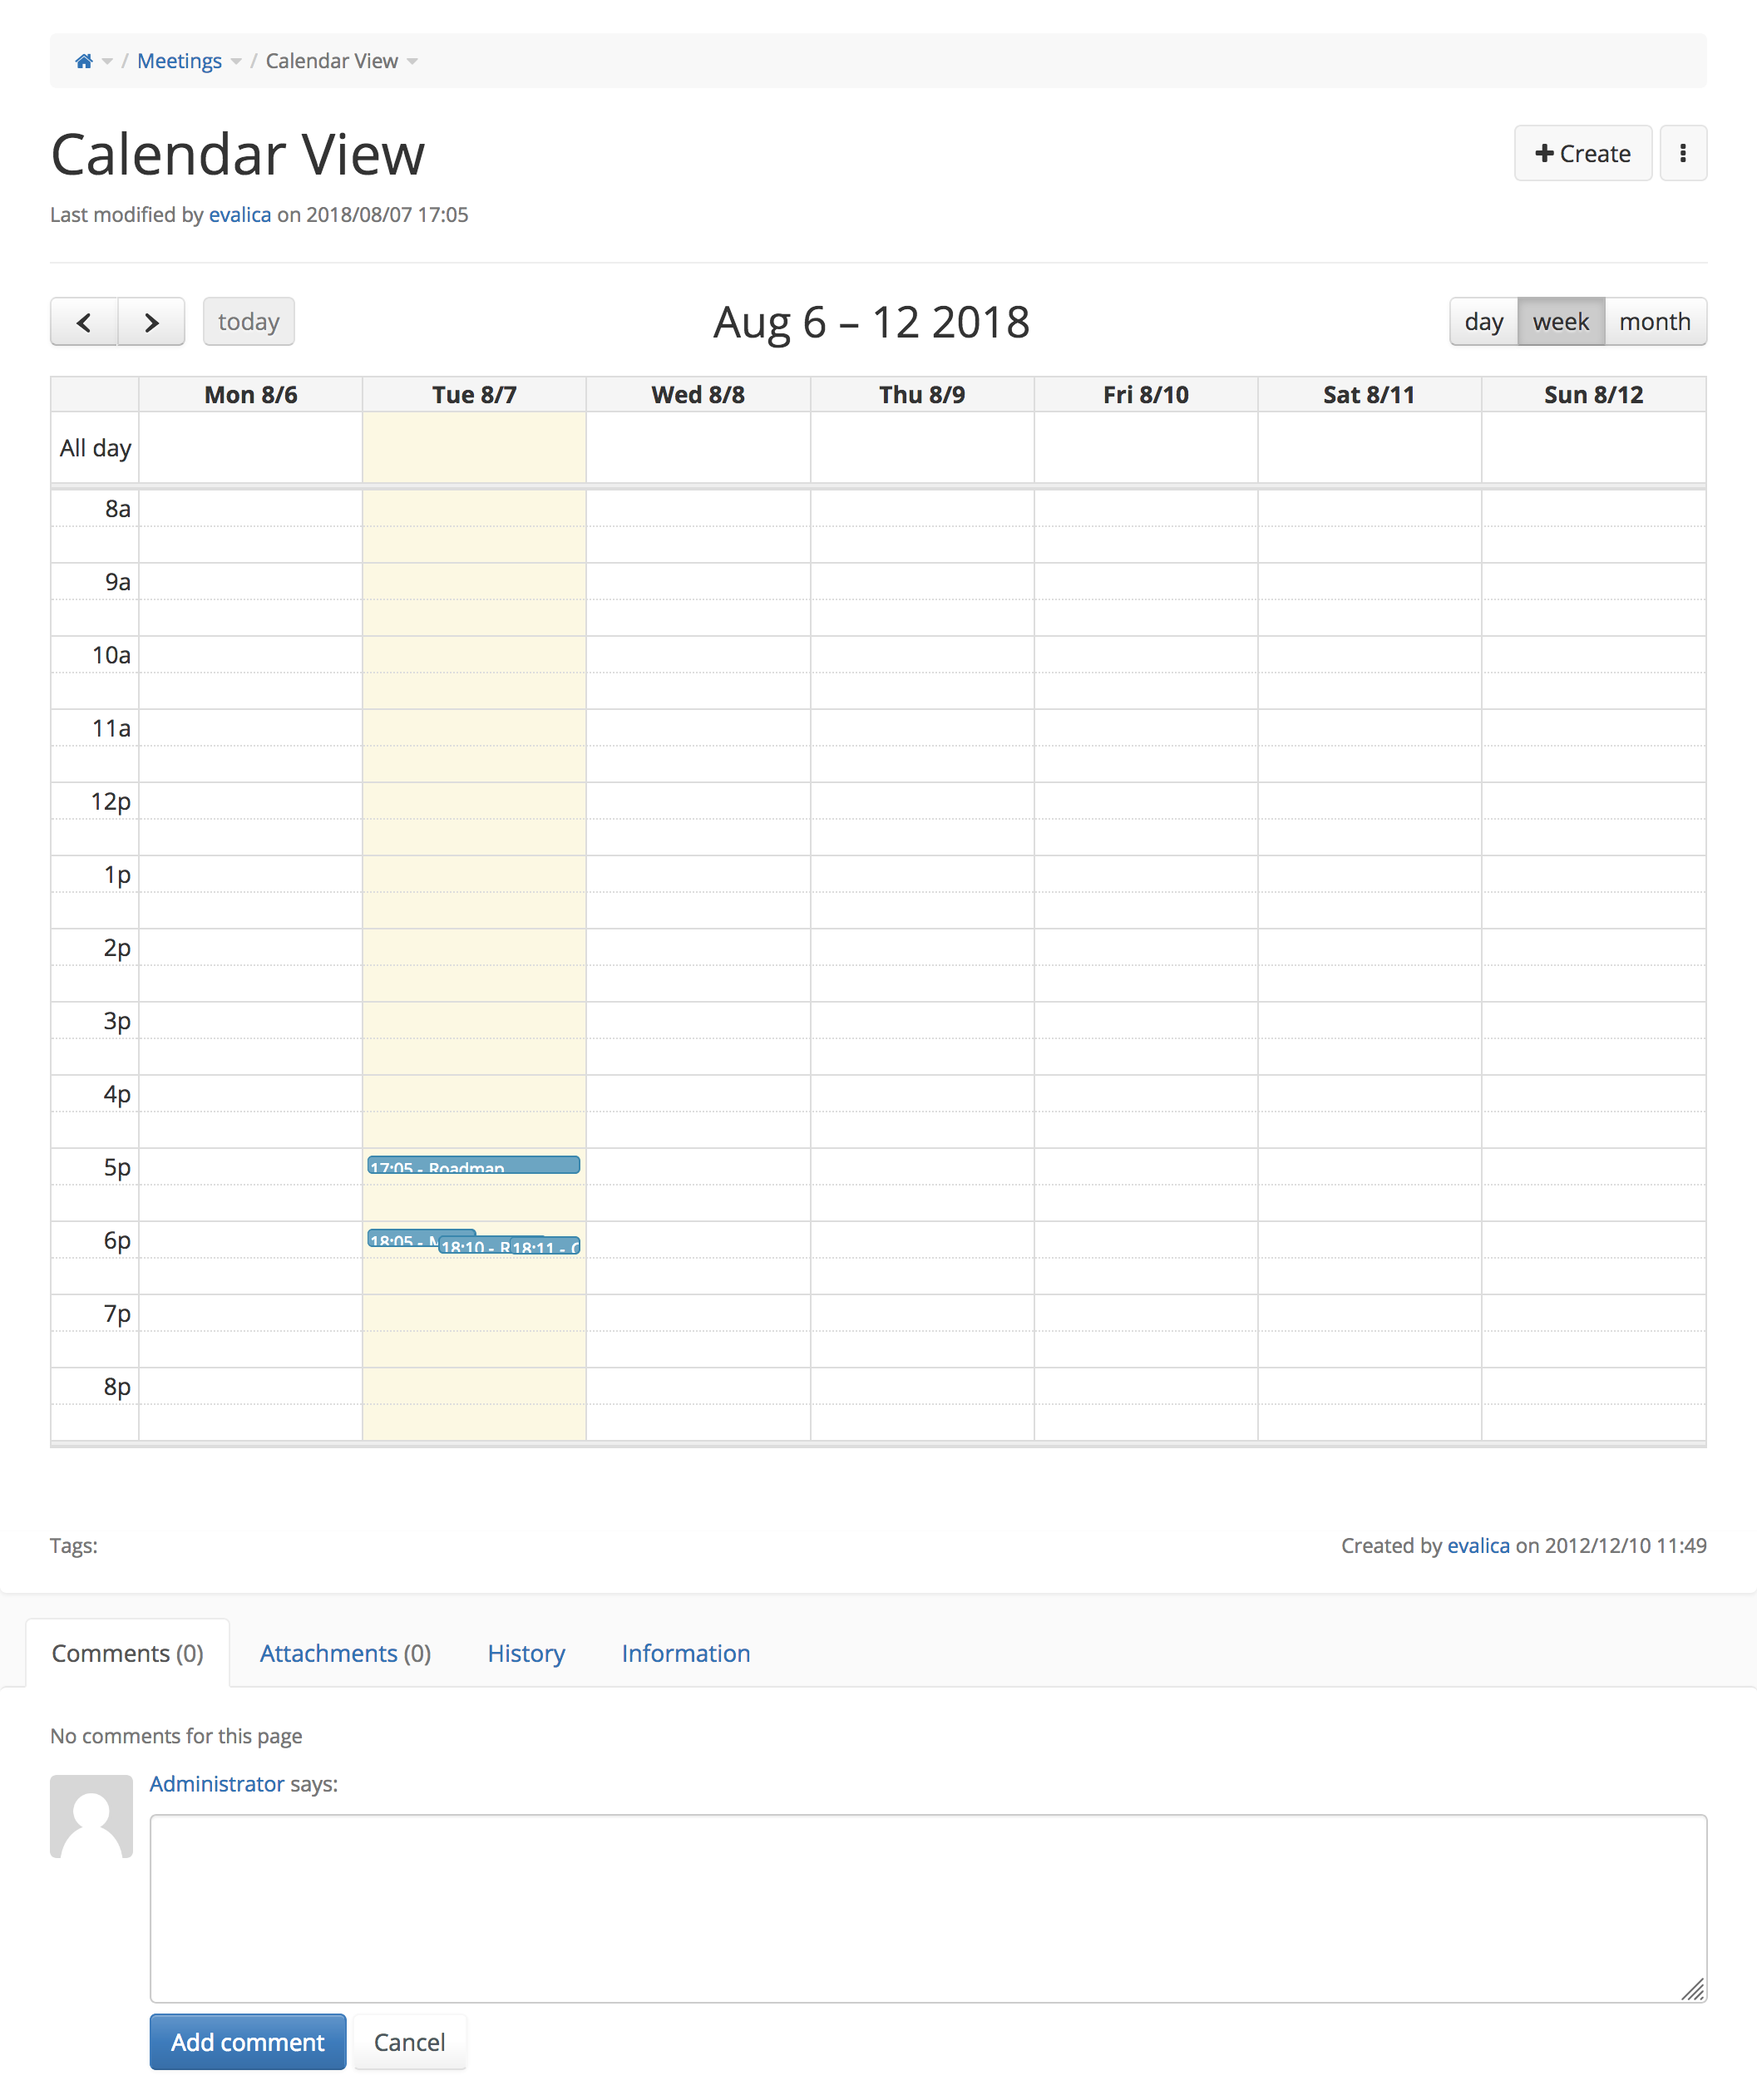 screenshot_2018-08-07 calendar view - xwiki